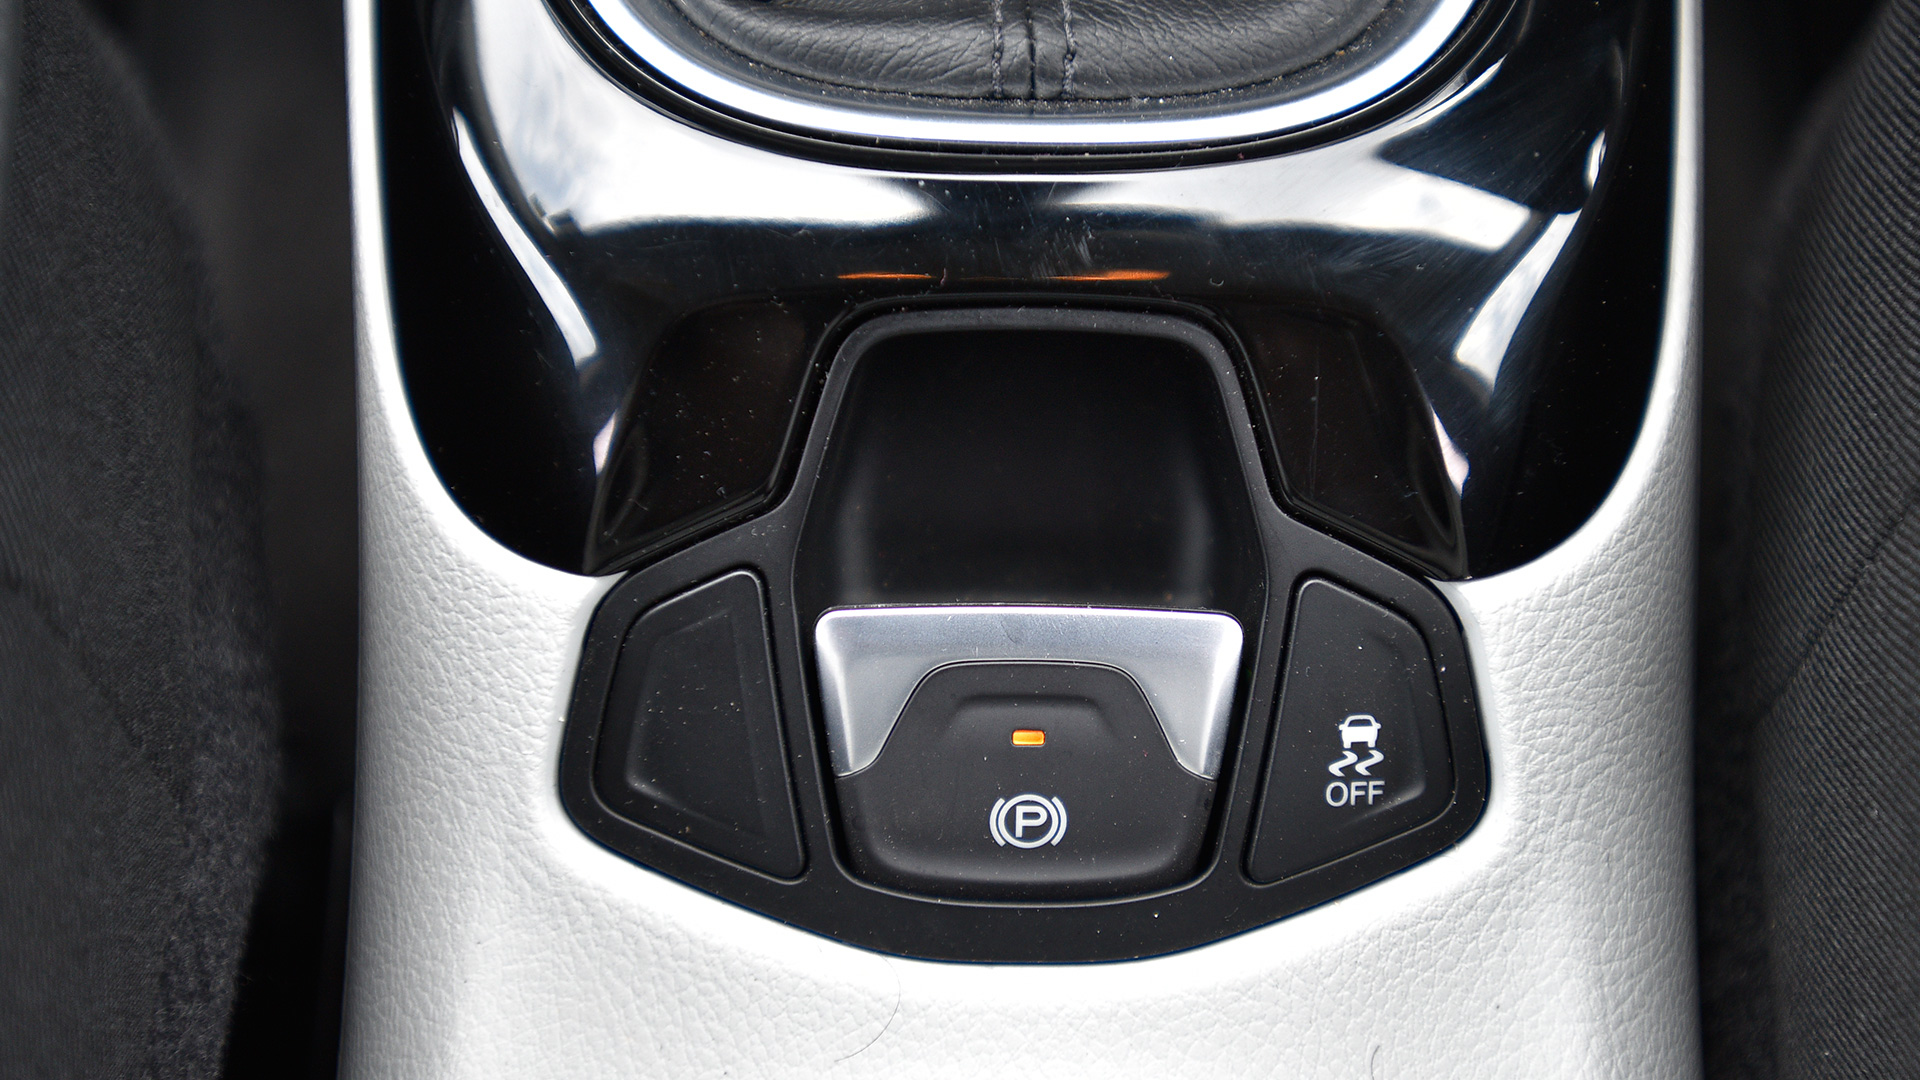 Jeep Compass 2017 Limited Diesel 4x4 Interior